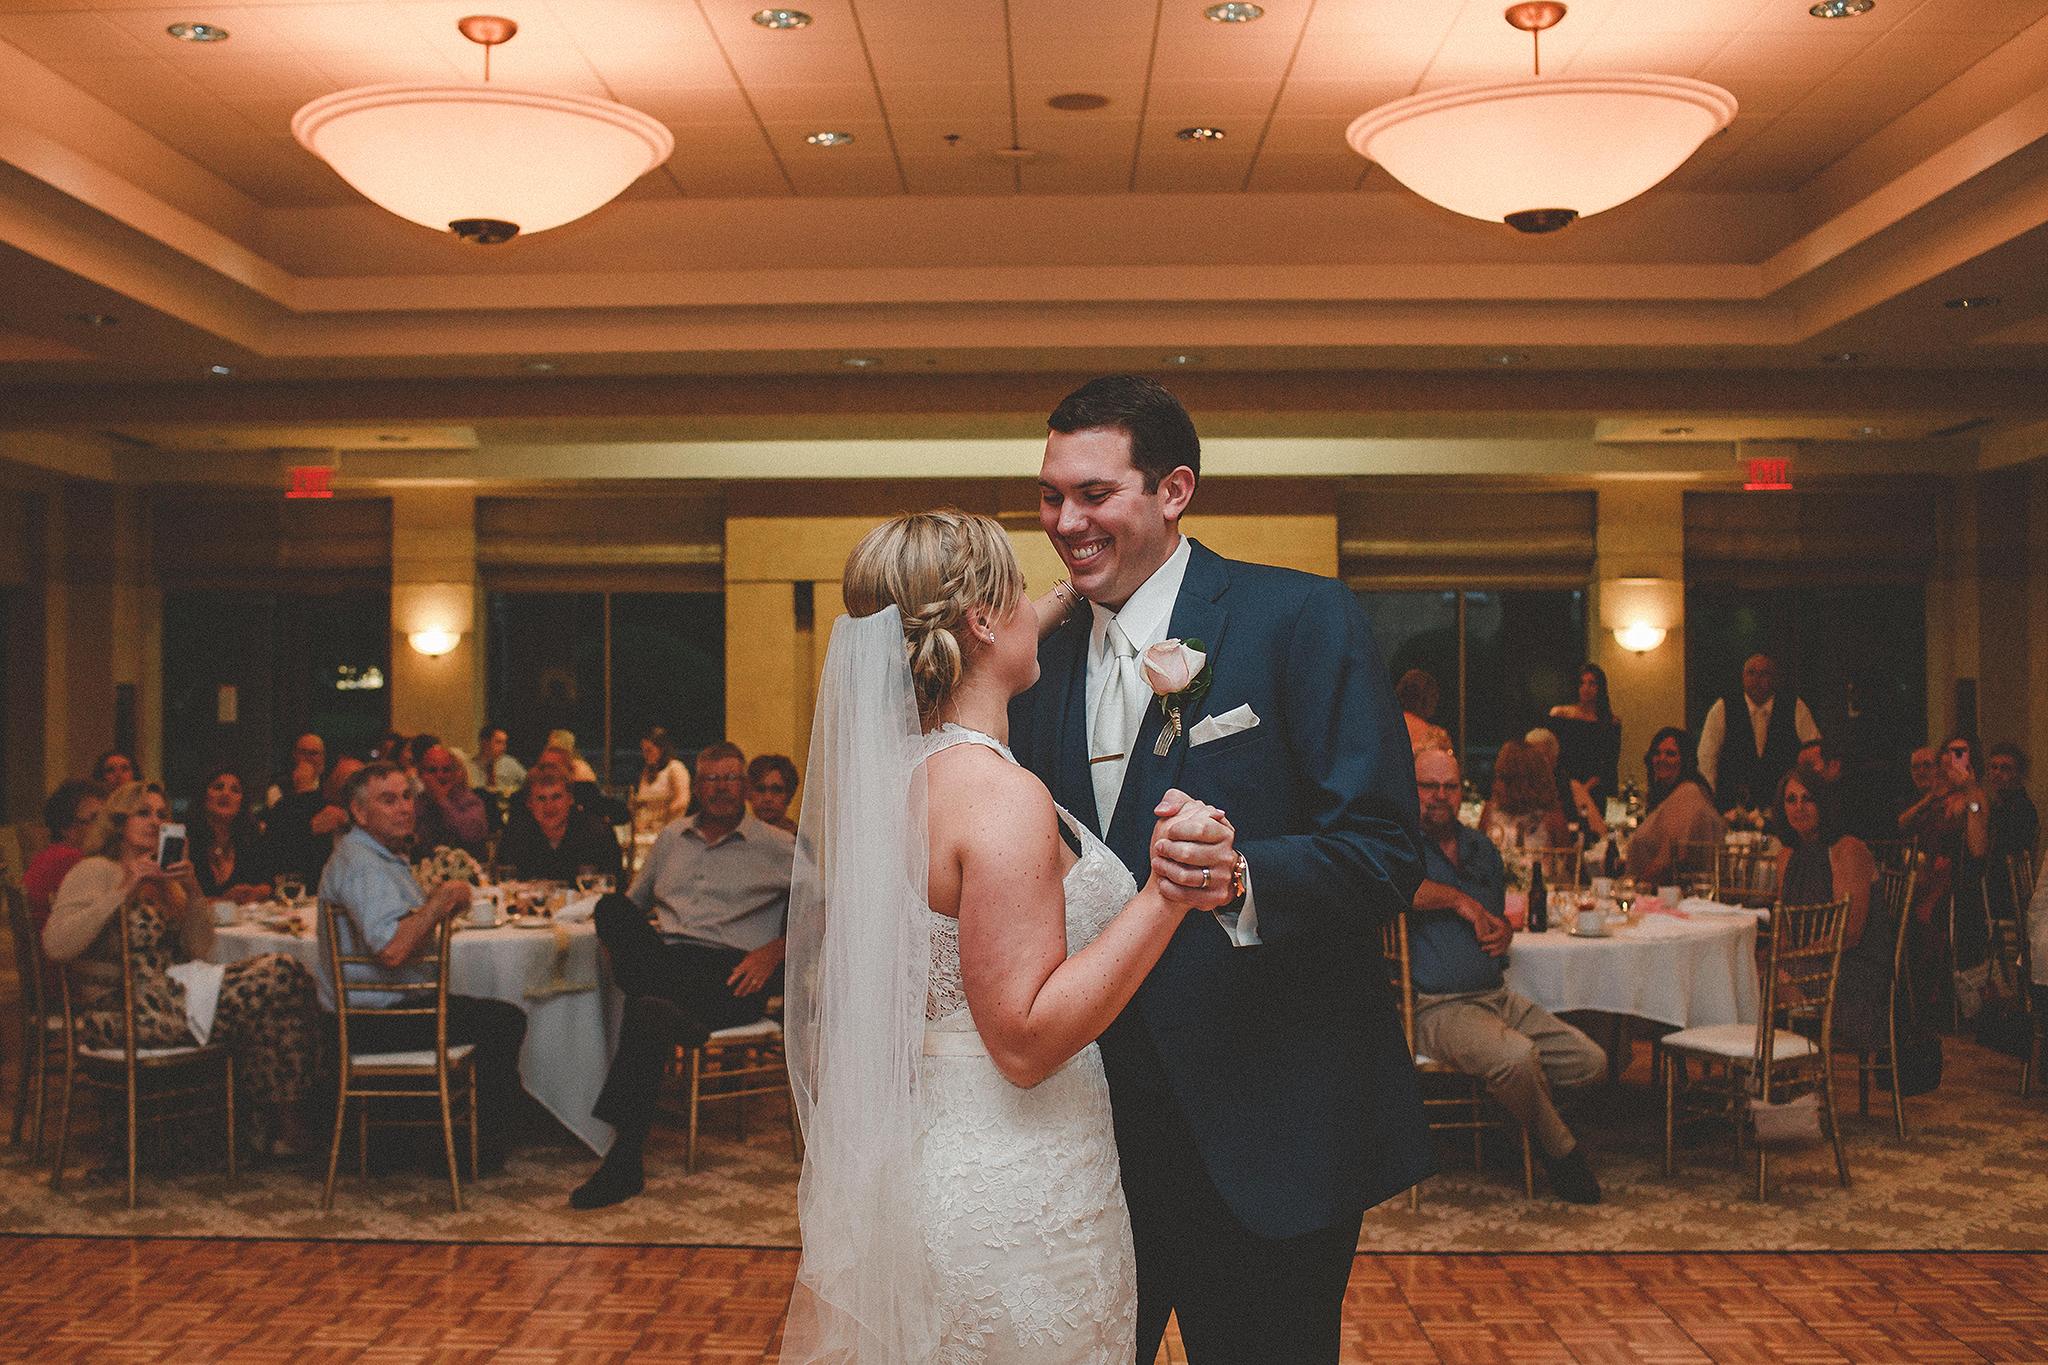 bride and groom first dance | barsema alumni center dekalb, IL wedding photographer